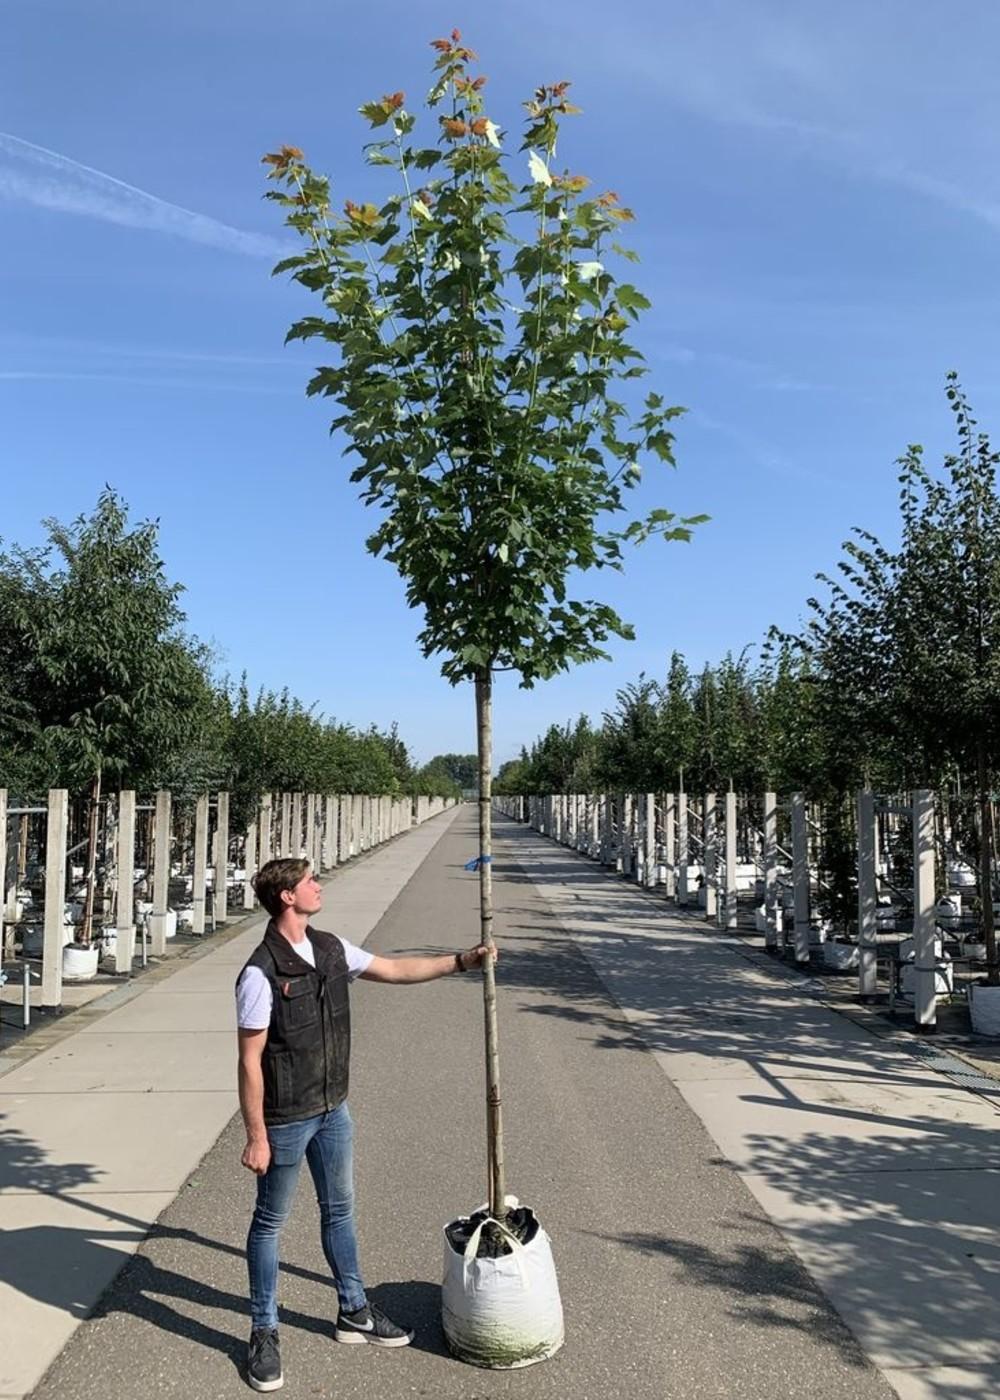 Rotahorn Scanlon   Acer rubrum 'Scanlon'